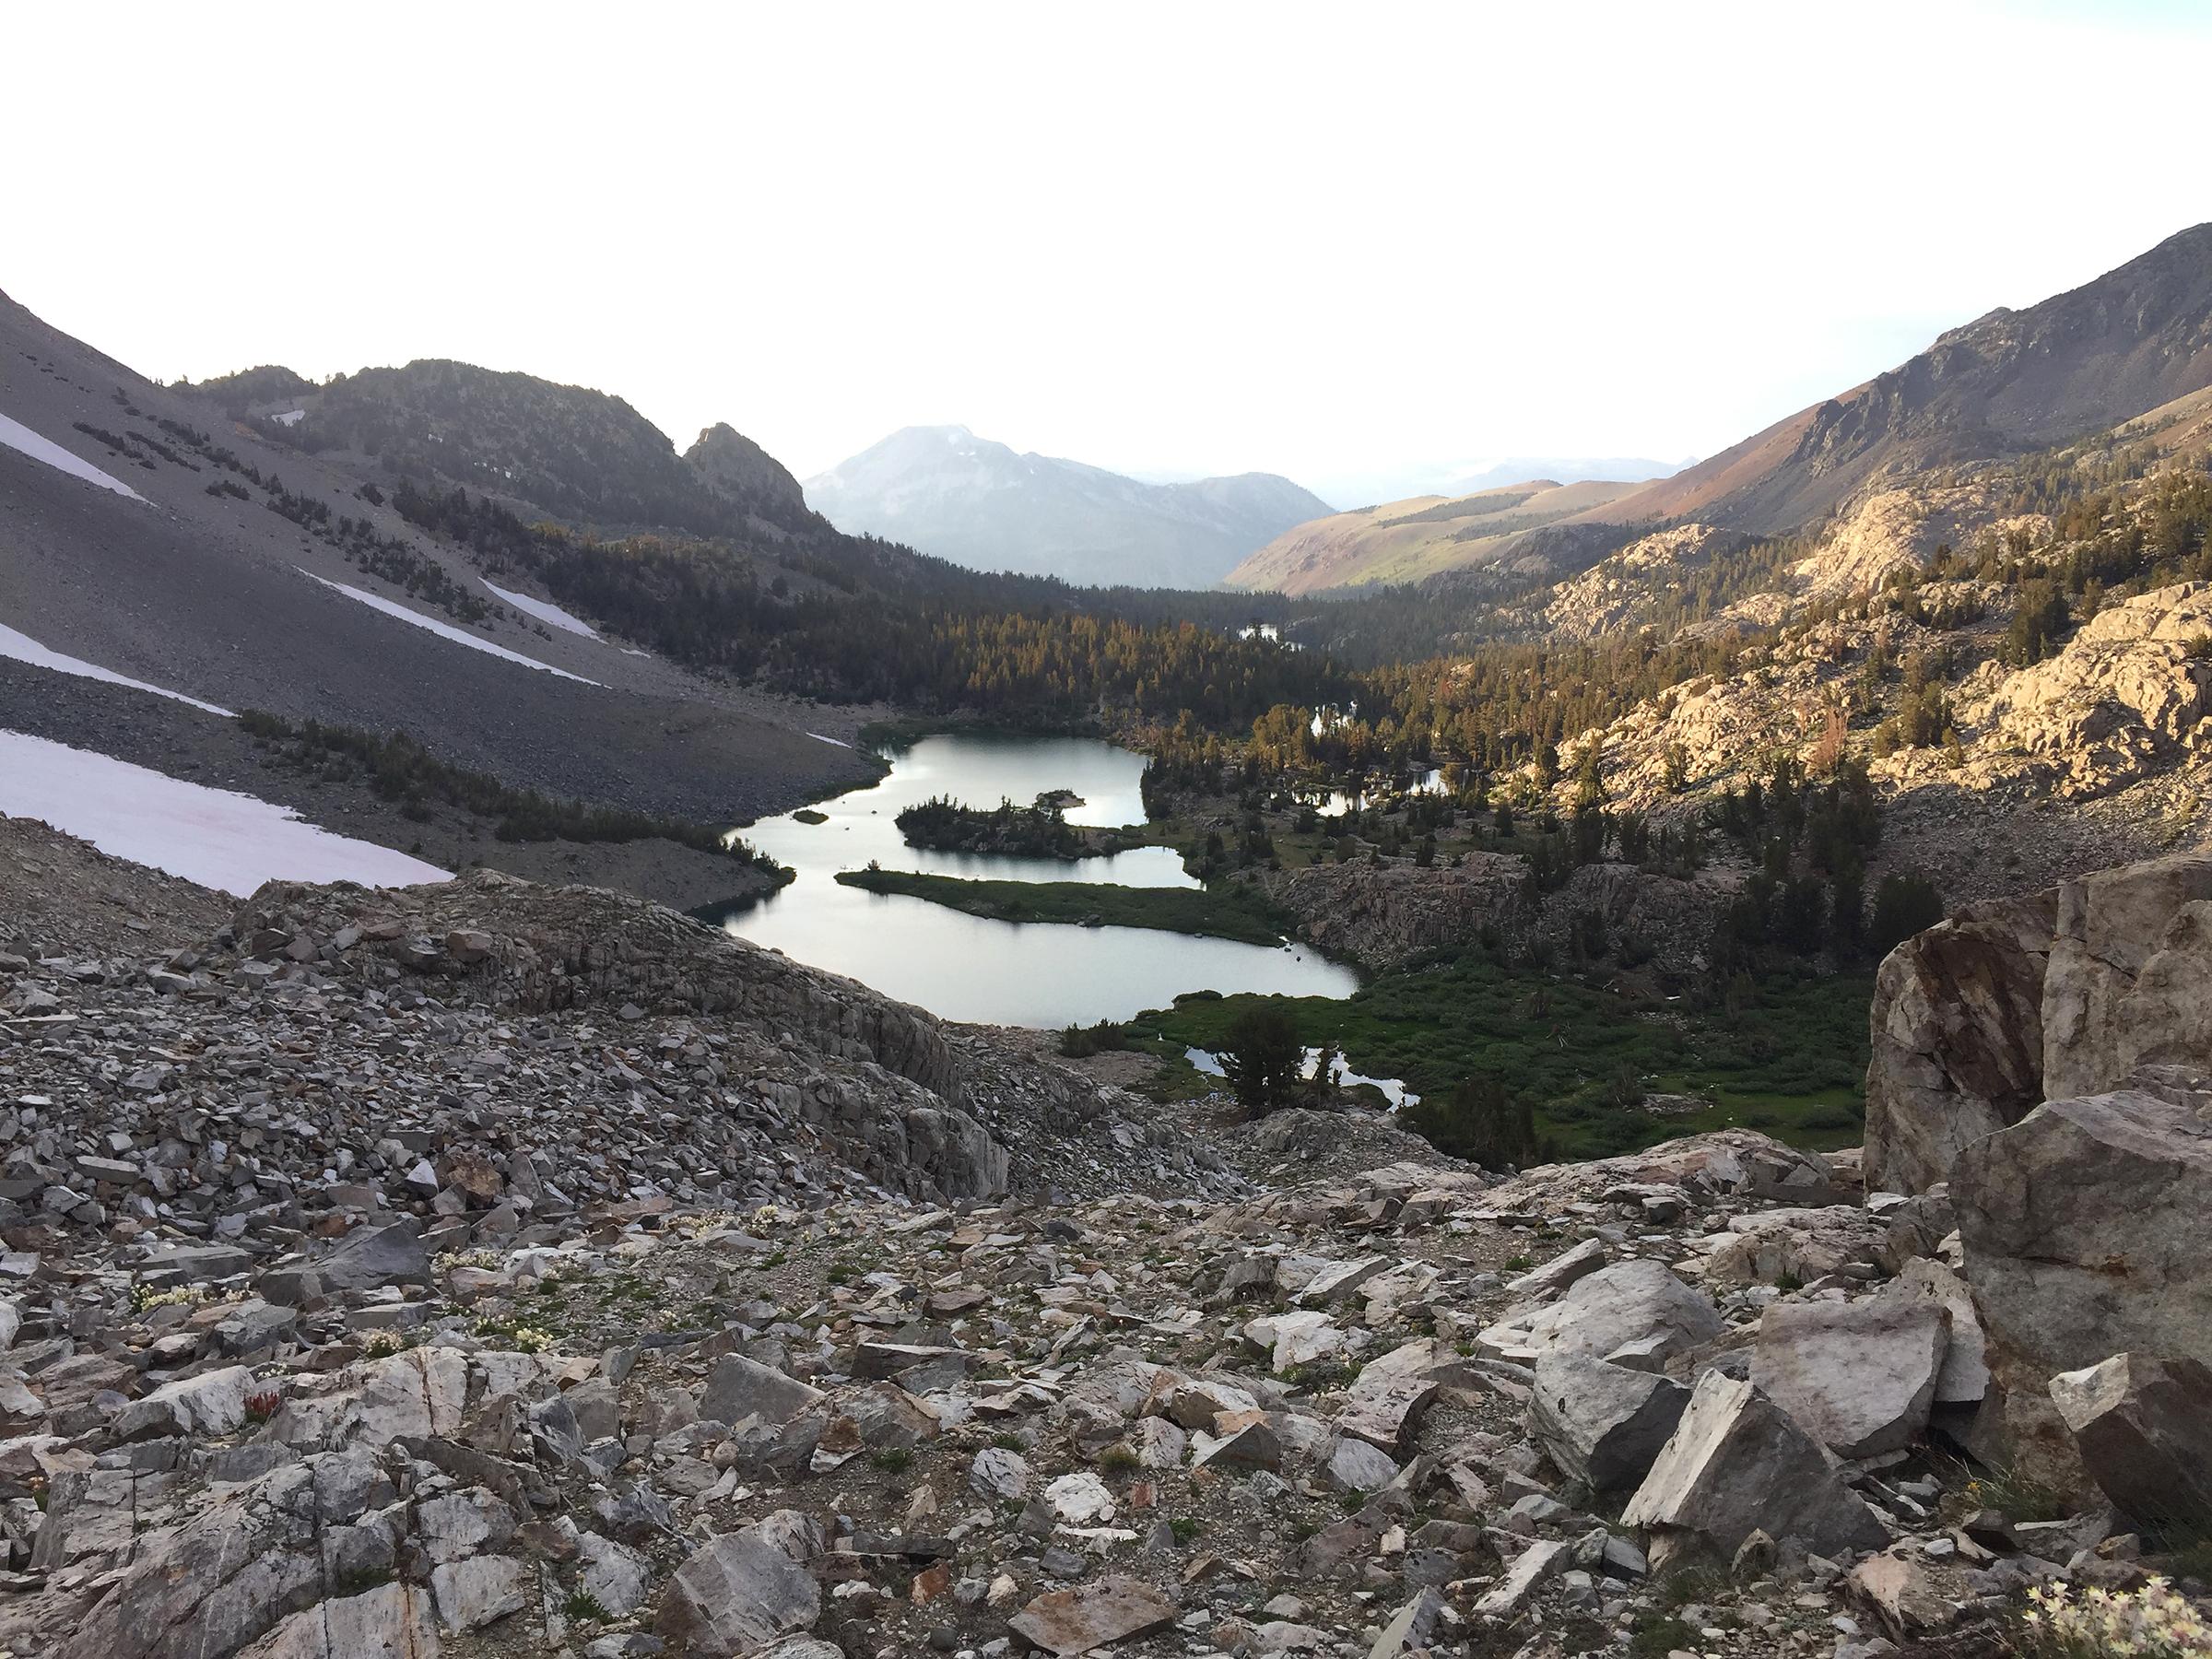 trailname-backstroke-sierra-high-route-2017_0850.jpg